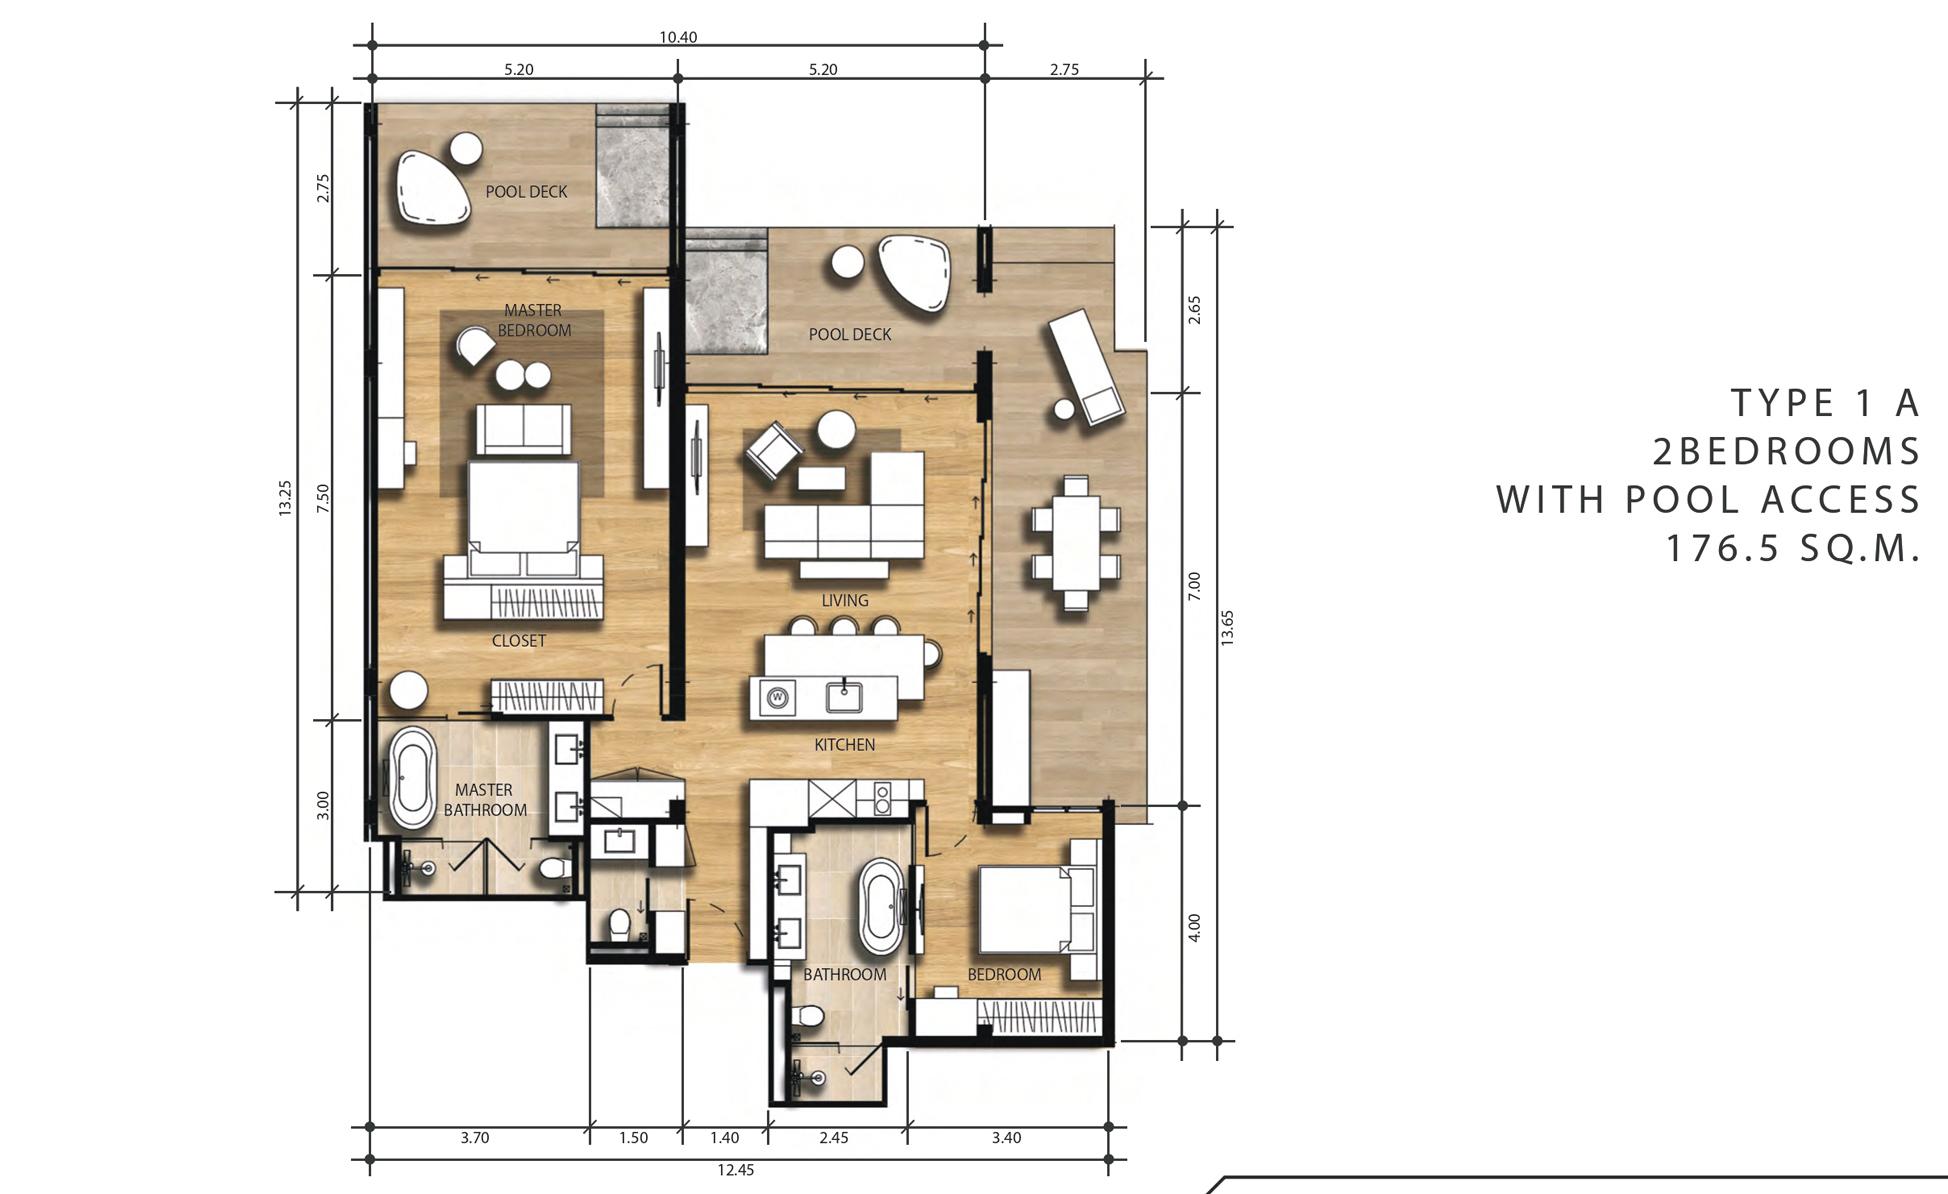 2 Bedroom Suite Pool Access